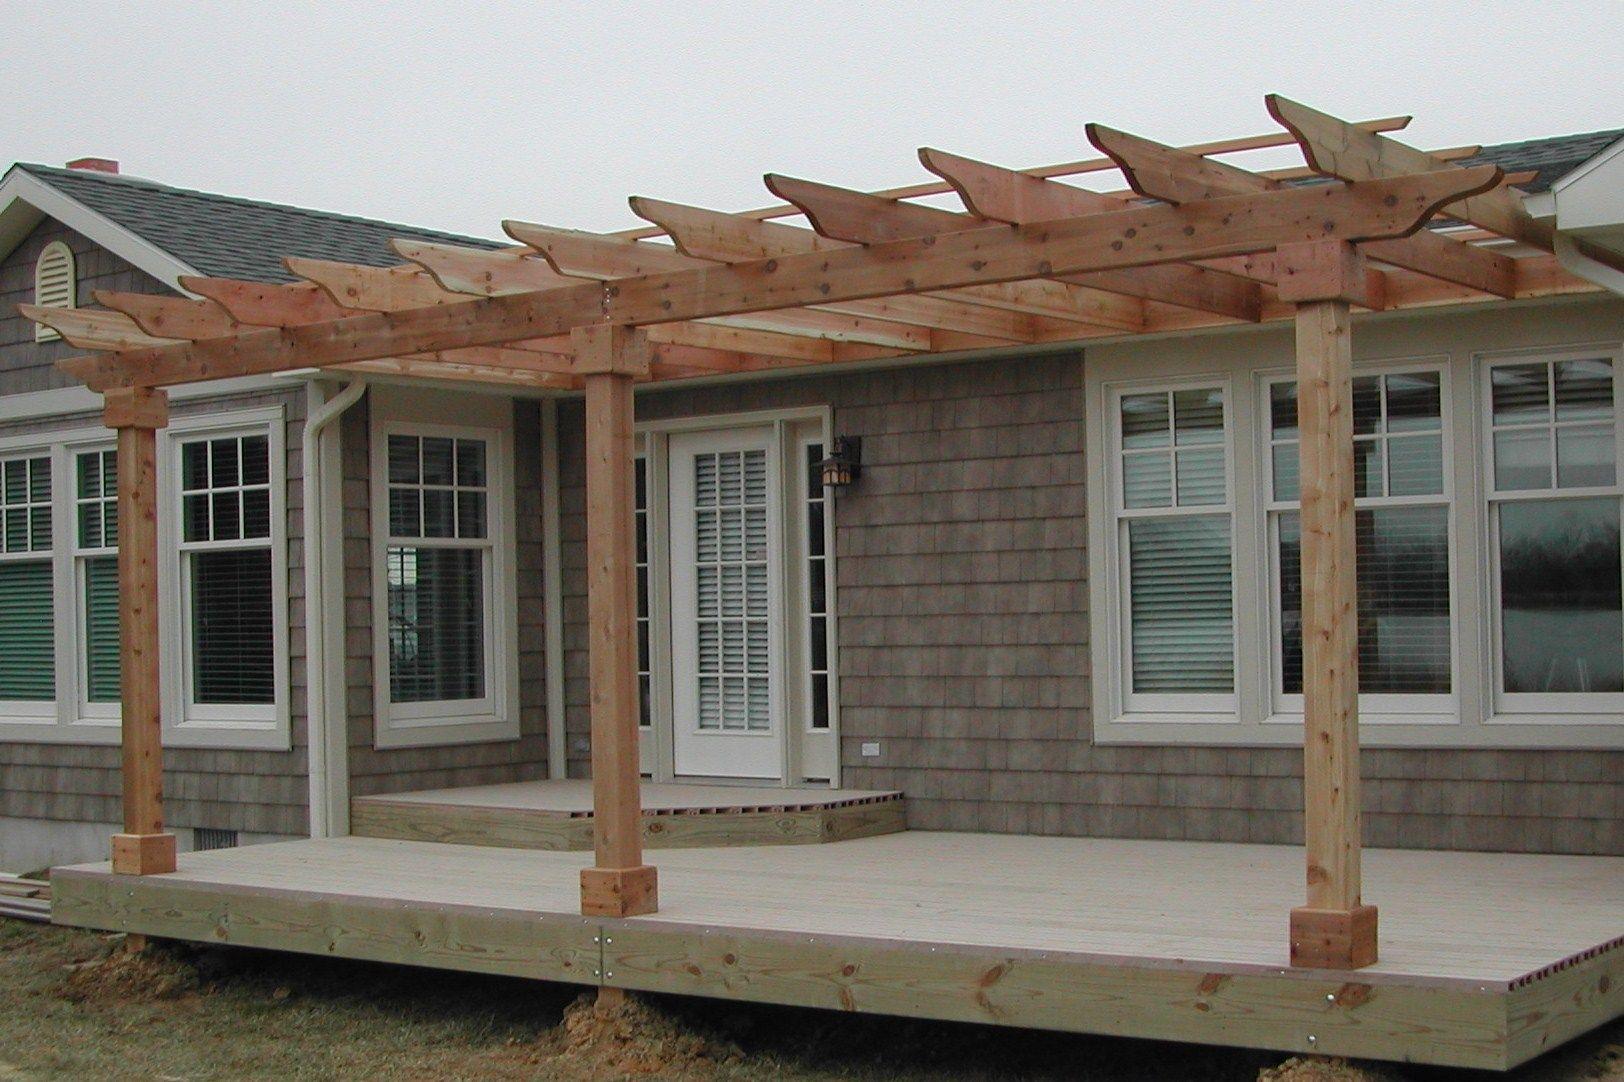 Side of house pergola | Pergola, Backyard pergola, Porch ... on Side Yard Pergola Ideas id=65425